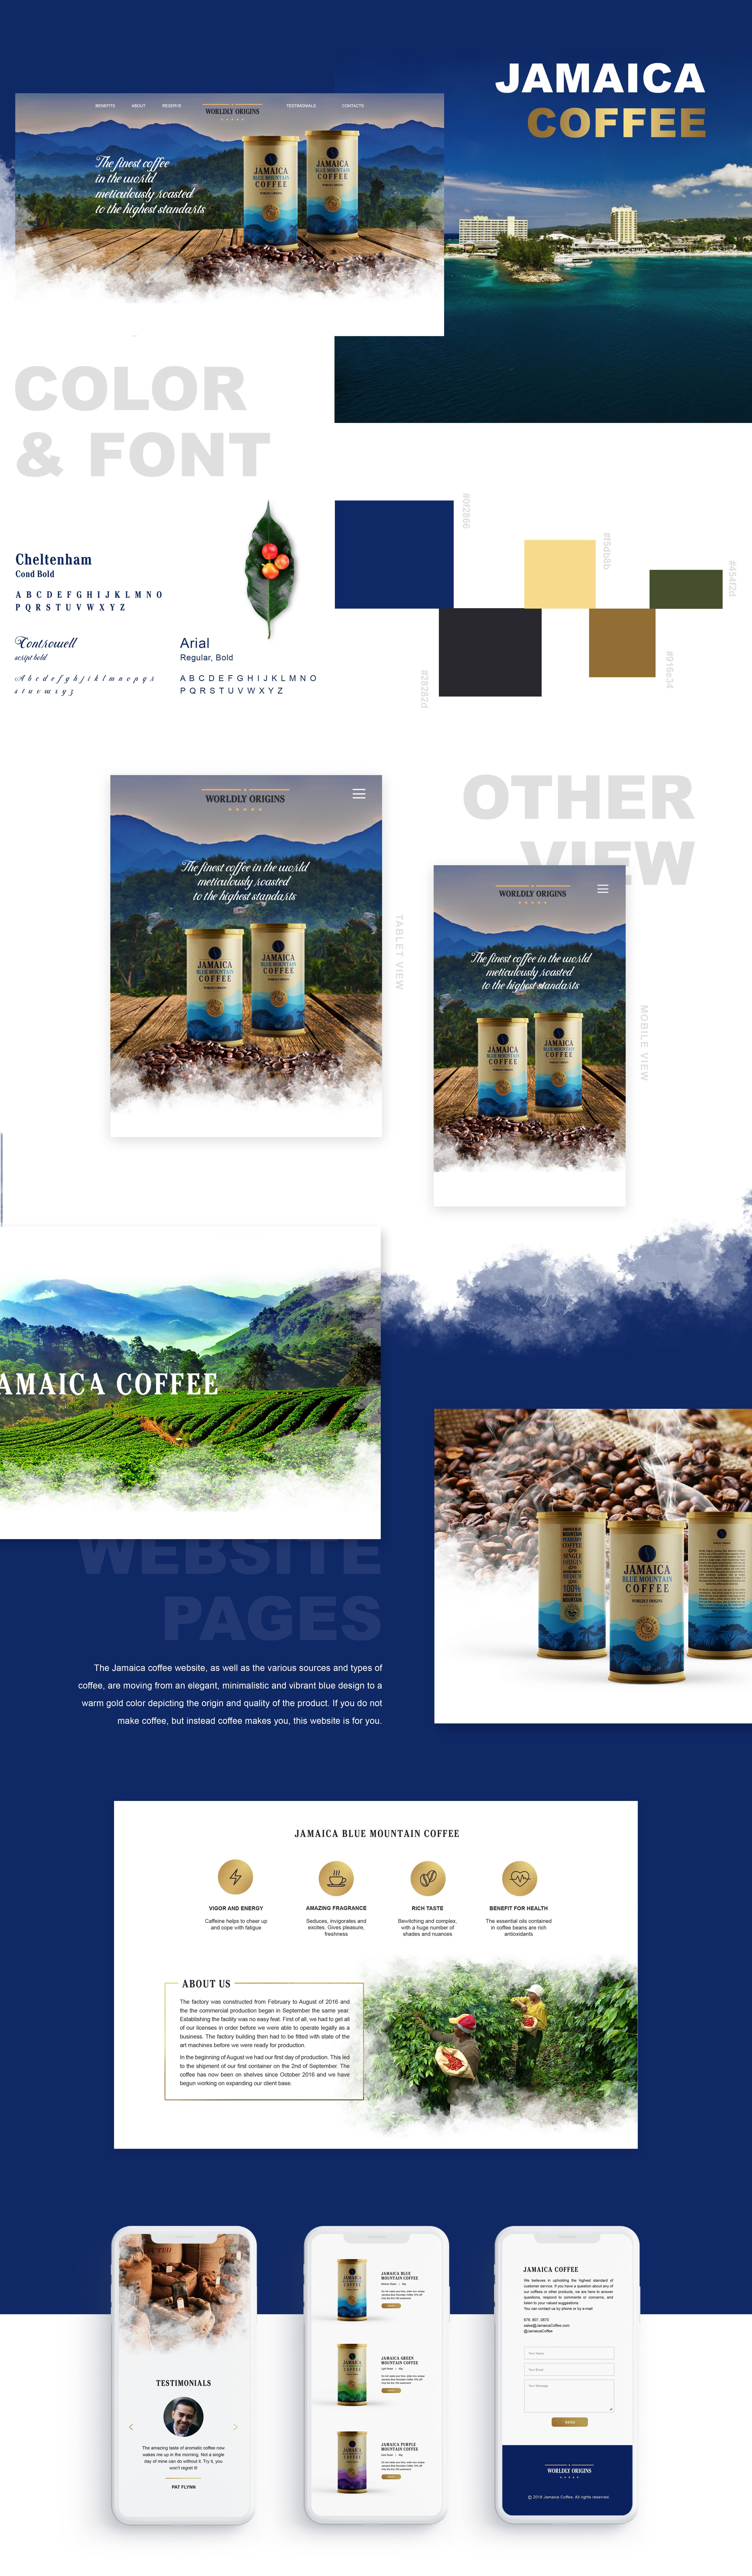 Jamaica-Coffee   Order No.1 Design Website   Branding Agency Web & Development